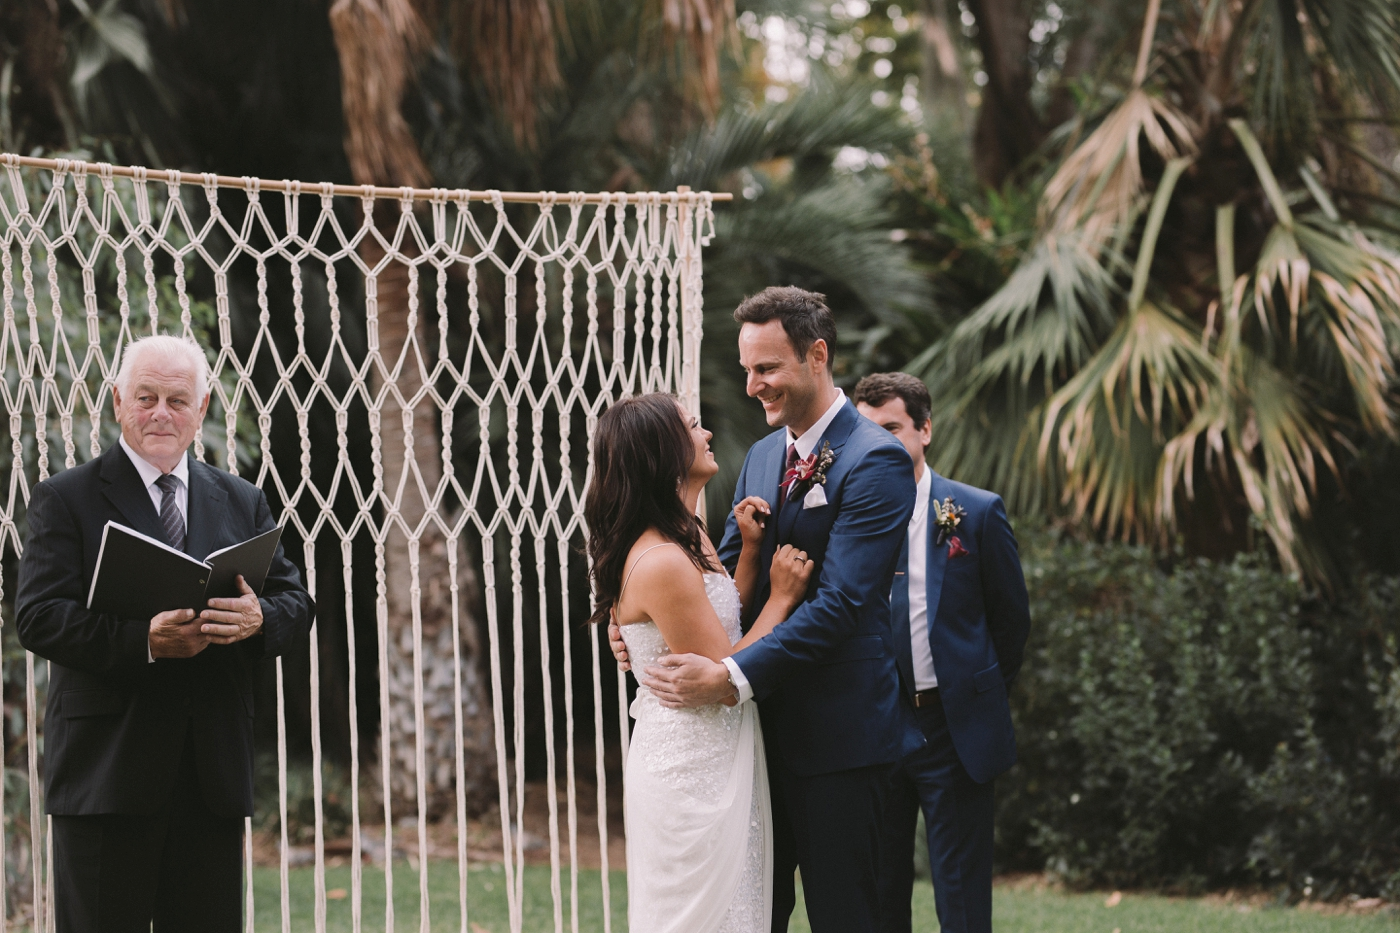 Kellie & Brent - Adelaide City Wedding - Natural wedding photography in Adelaide - Katherine Schultz - www.katherineschultzphotography.com 41